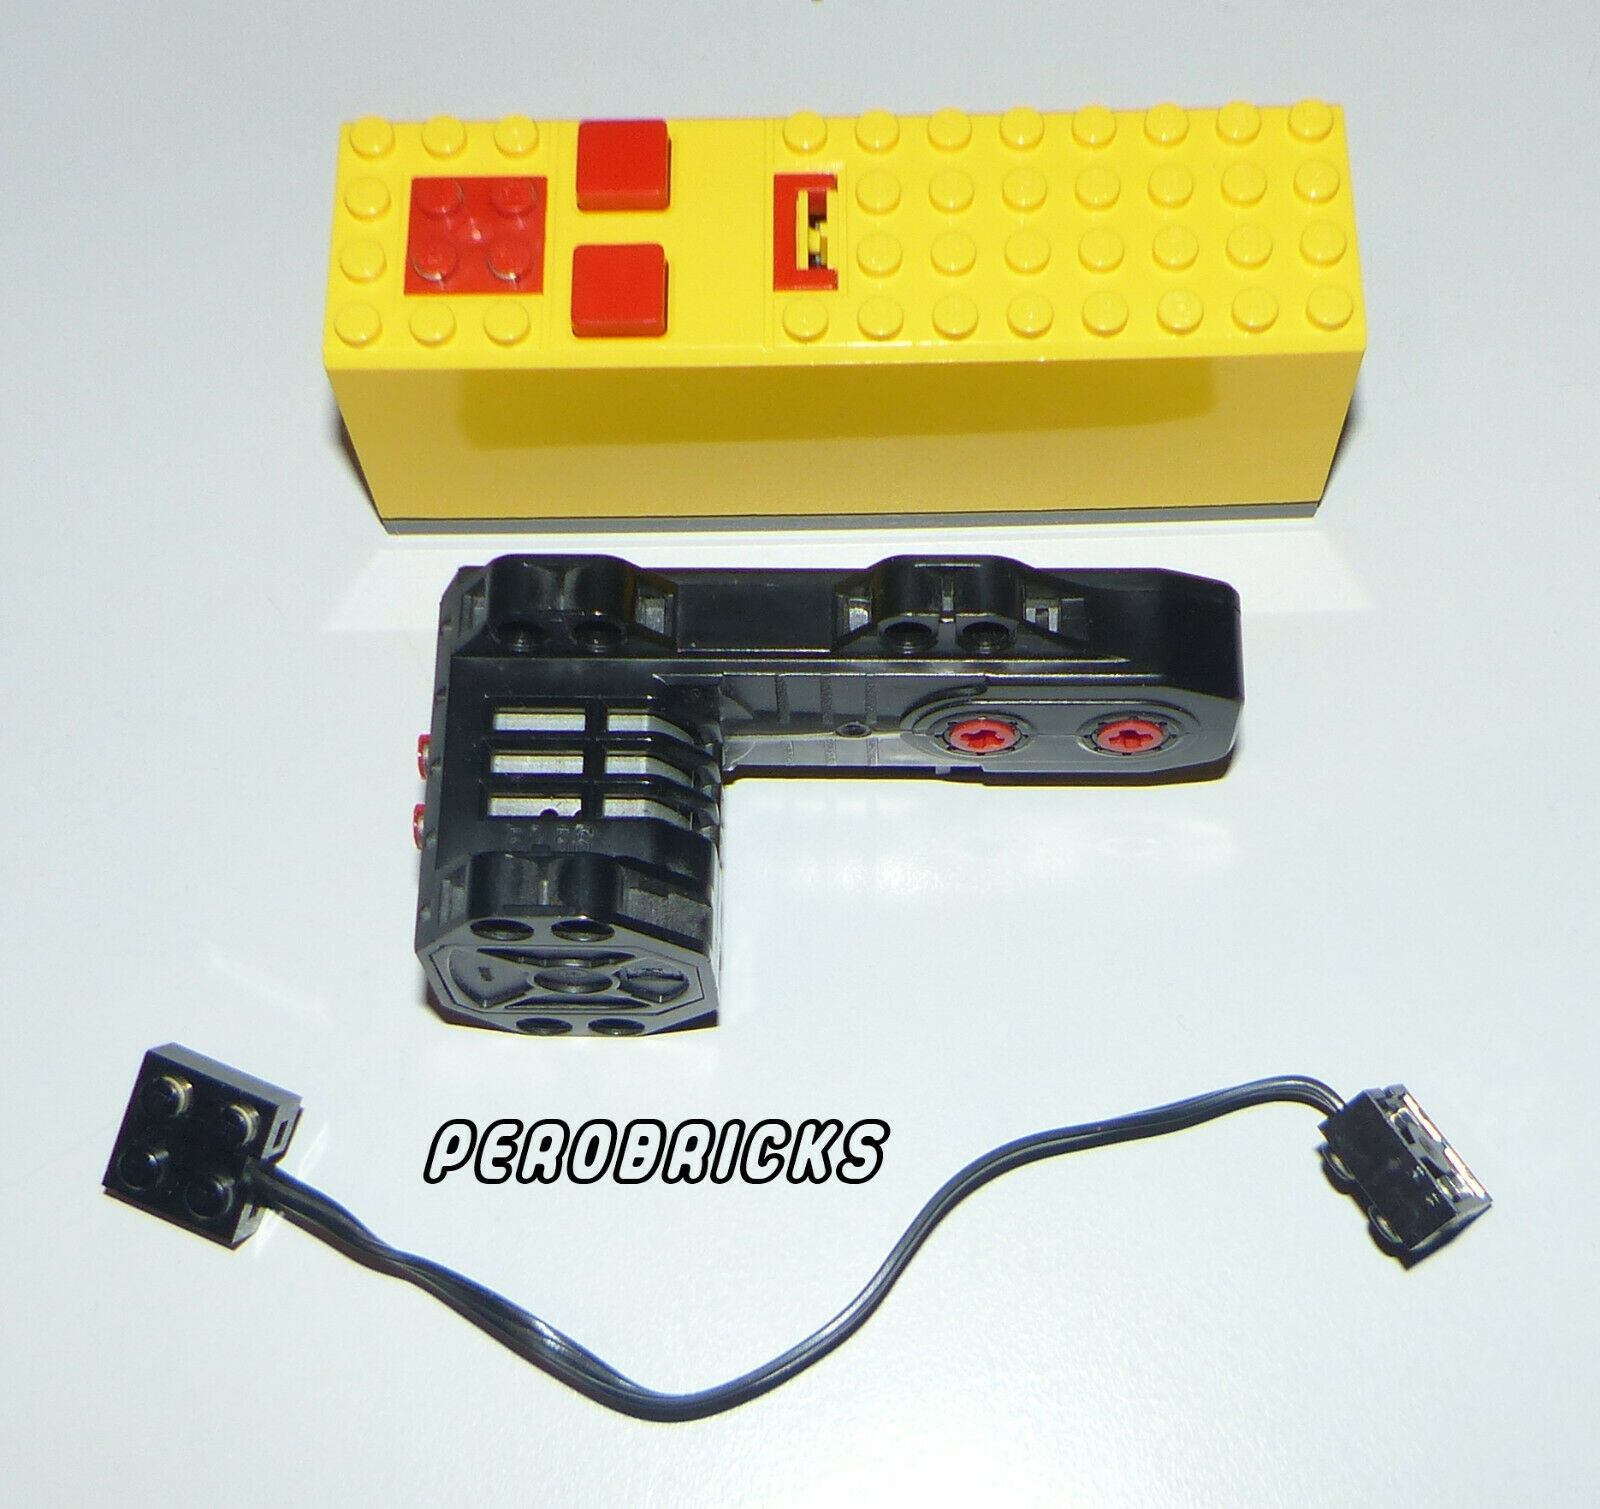 Lego Technic Technik 1 x Power Functions Motor 9V  5292 + Batteriekasten + Kabel